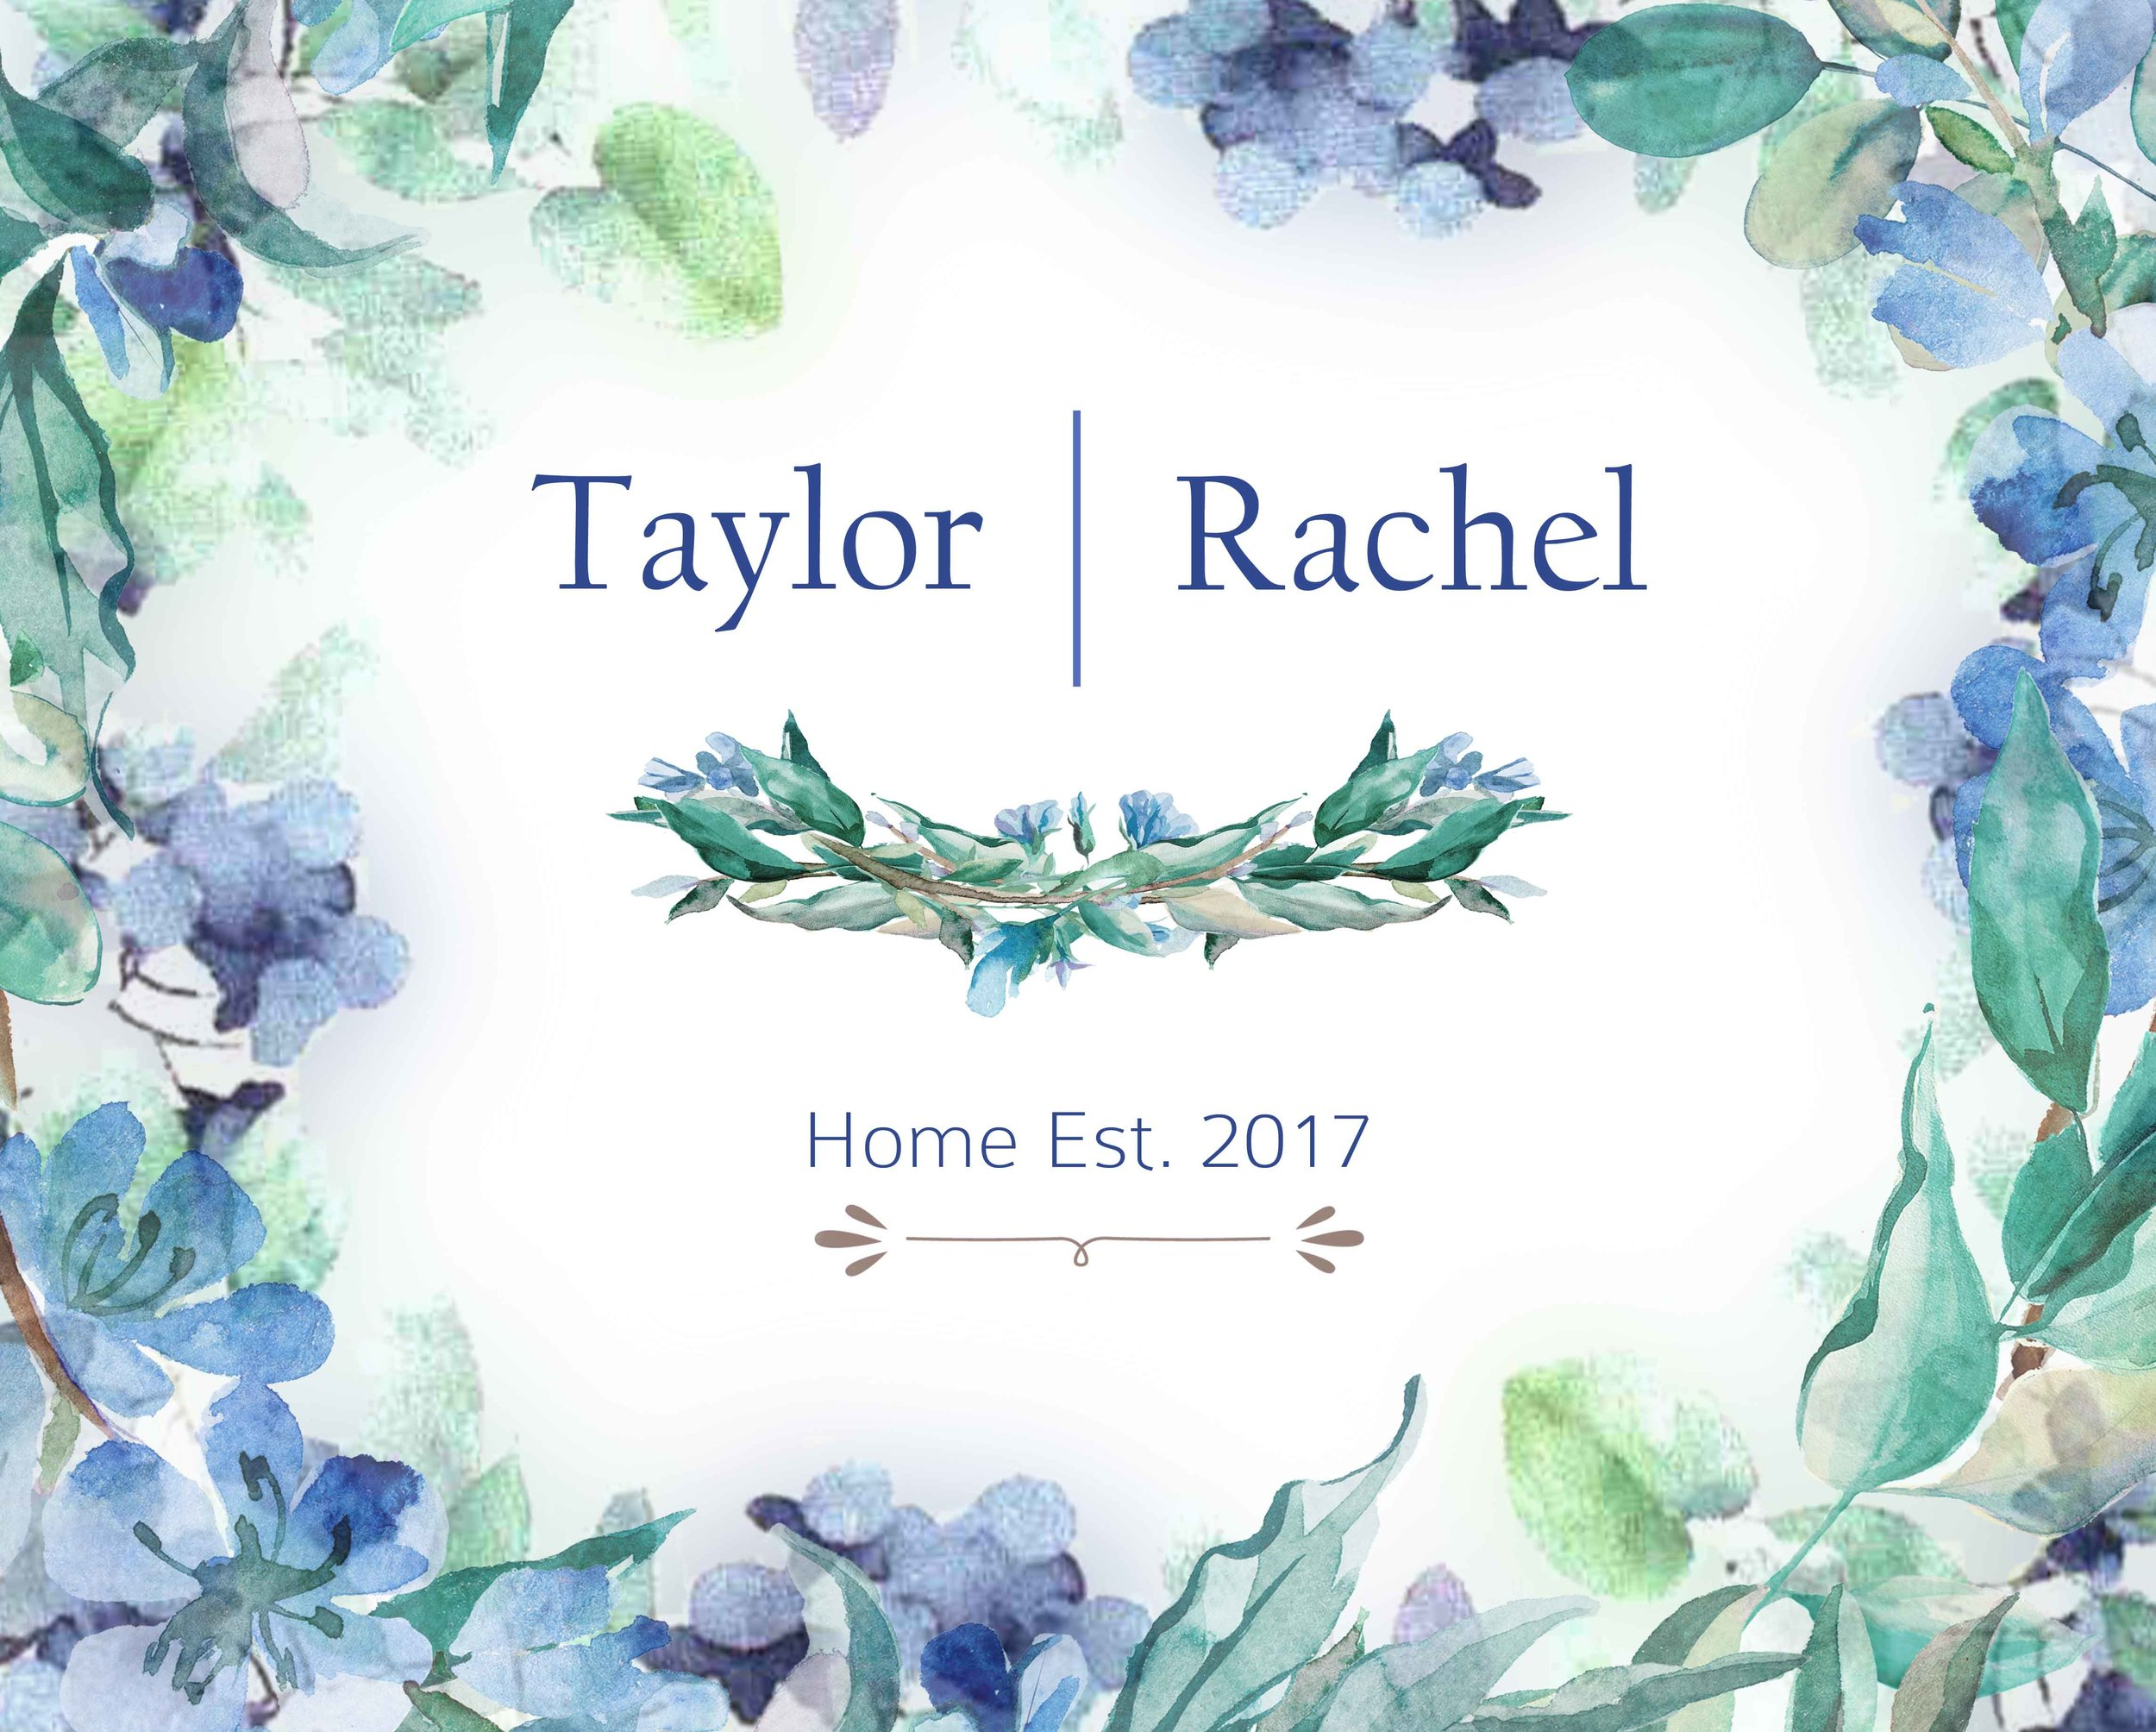 STORY_Taylor and Rachel.jpg